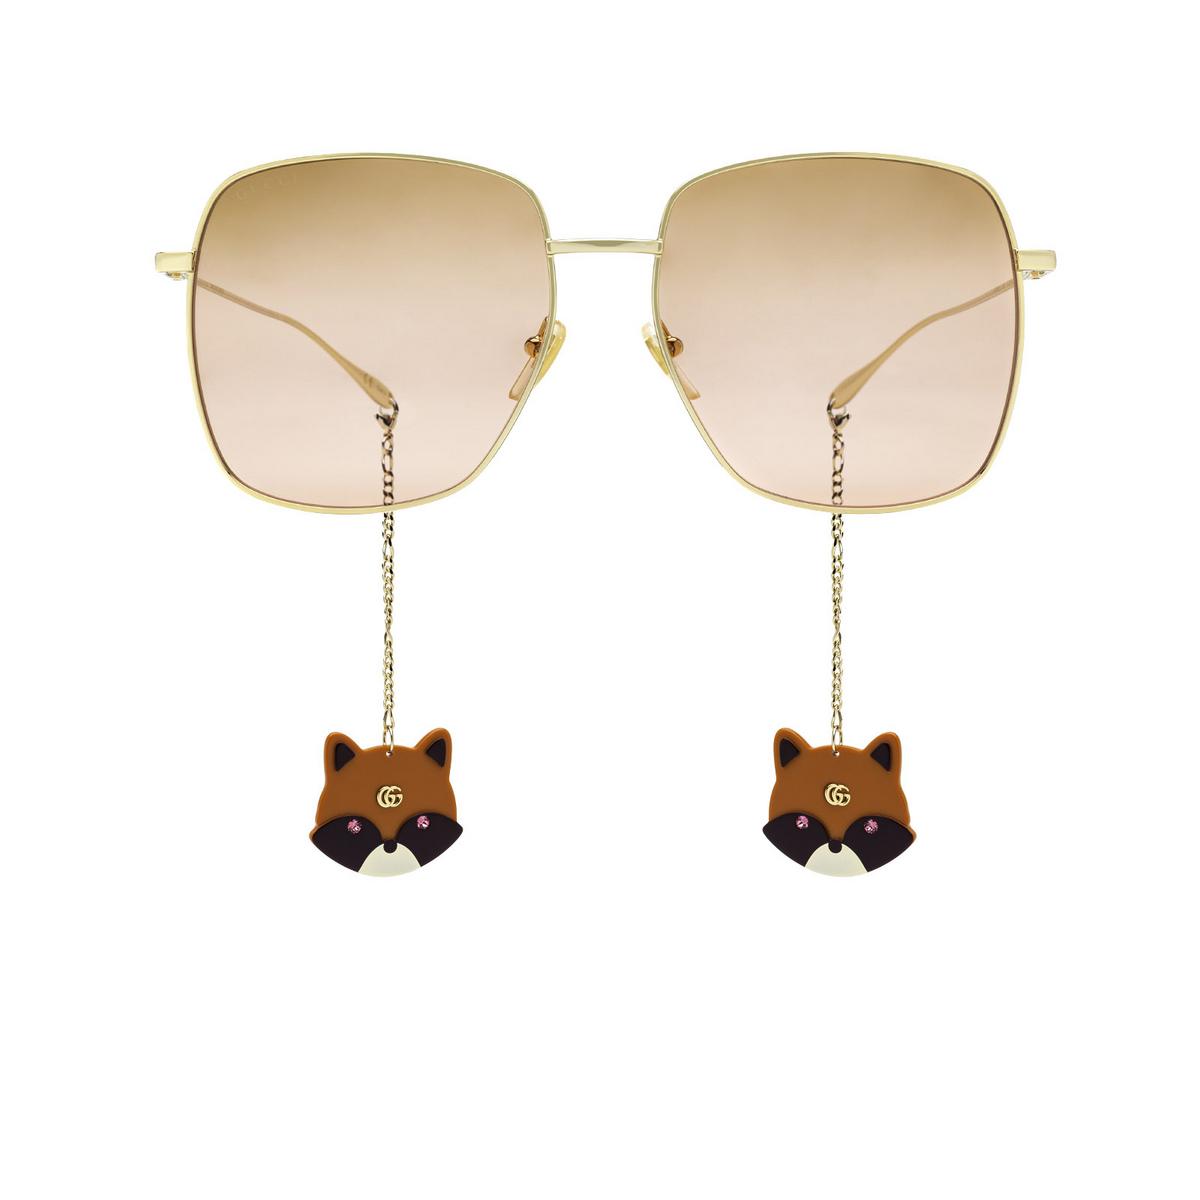 Gucci® Square Sunglasses: GG1031S color Gold 005 - front view.